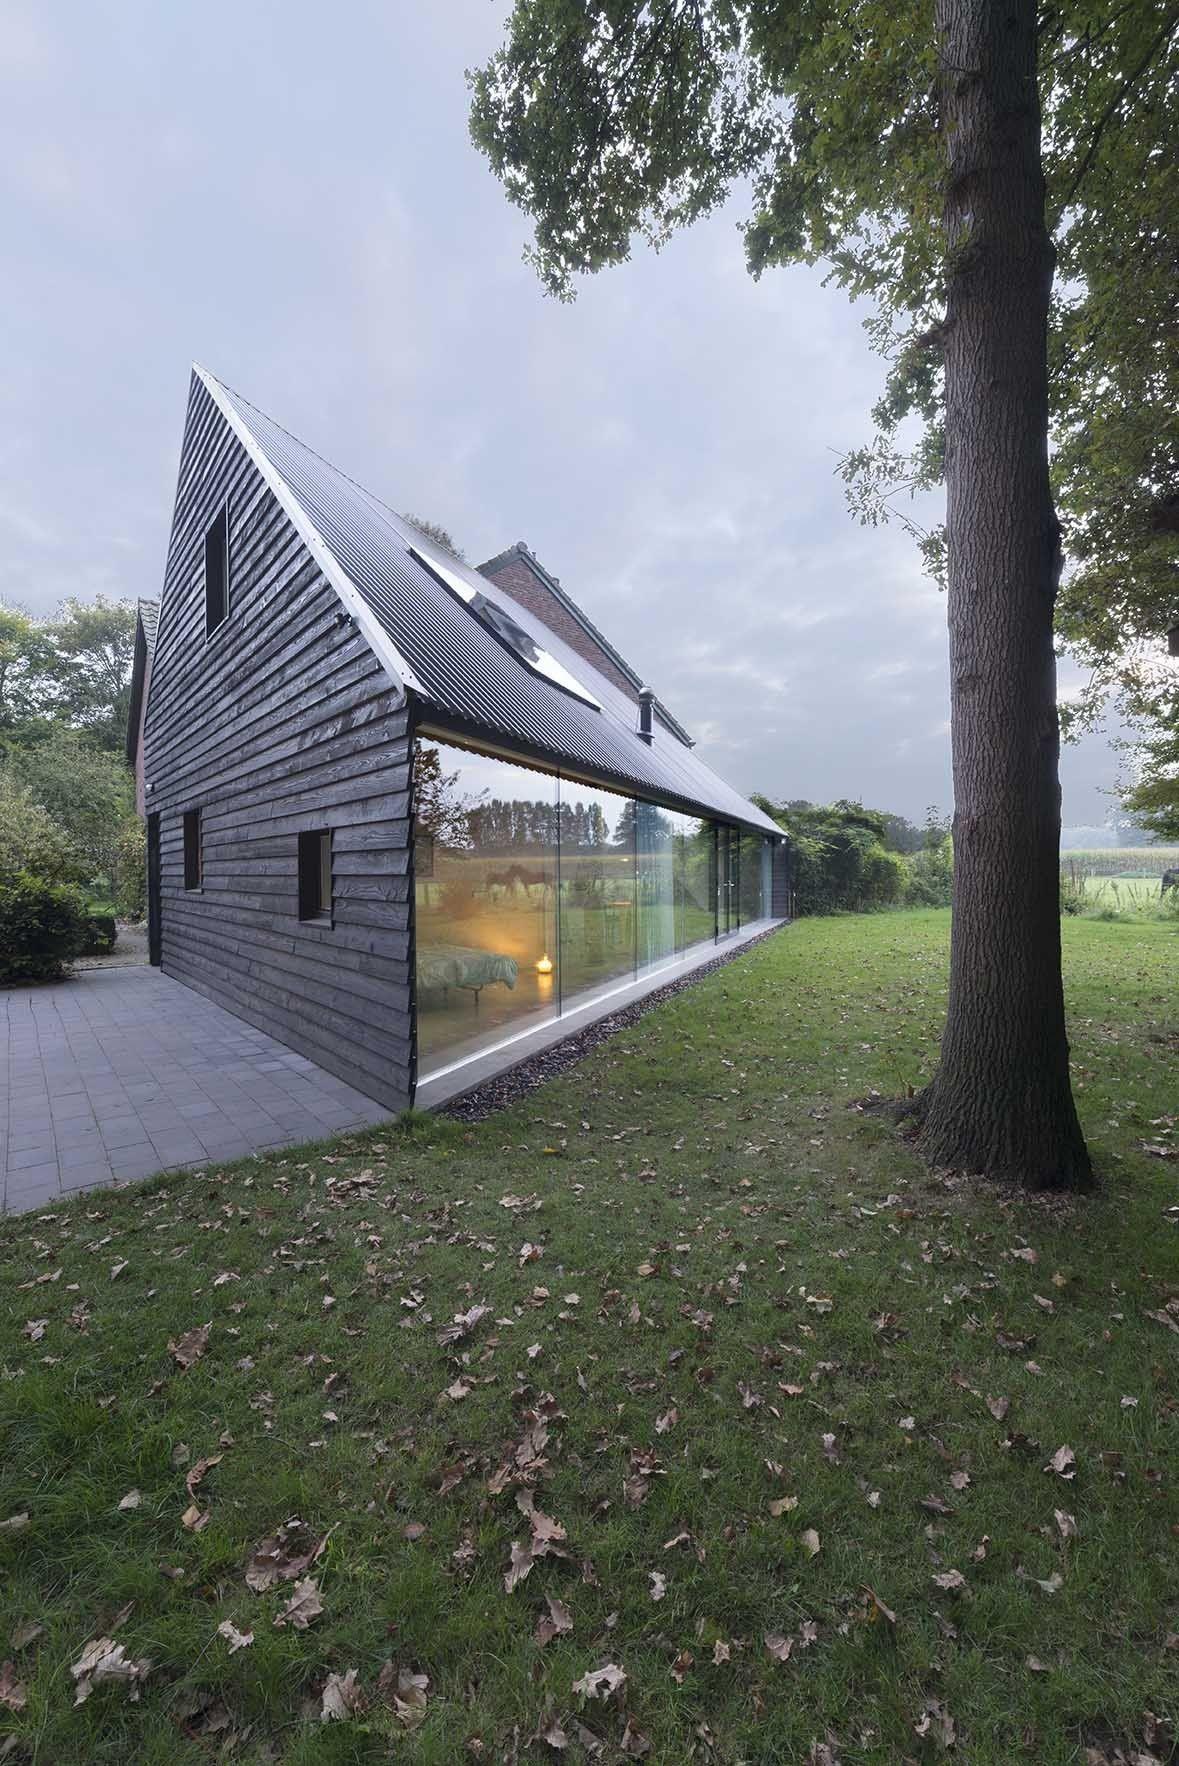 Galeria De Residencia Em Almen Barend Koolhaas 1 Countryside House Architecture Modern Architecture